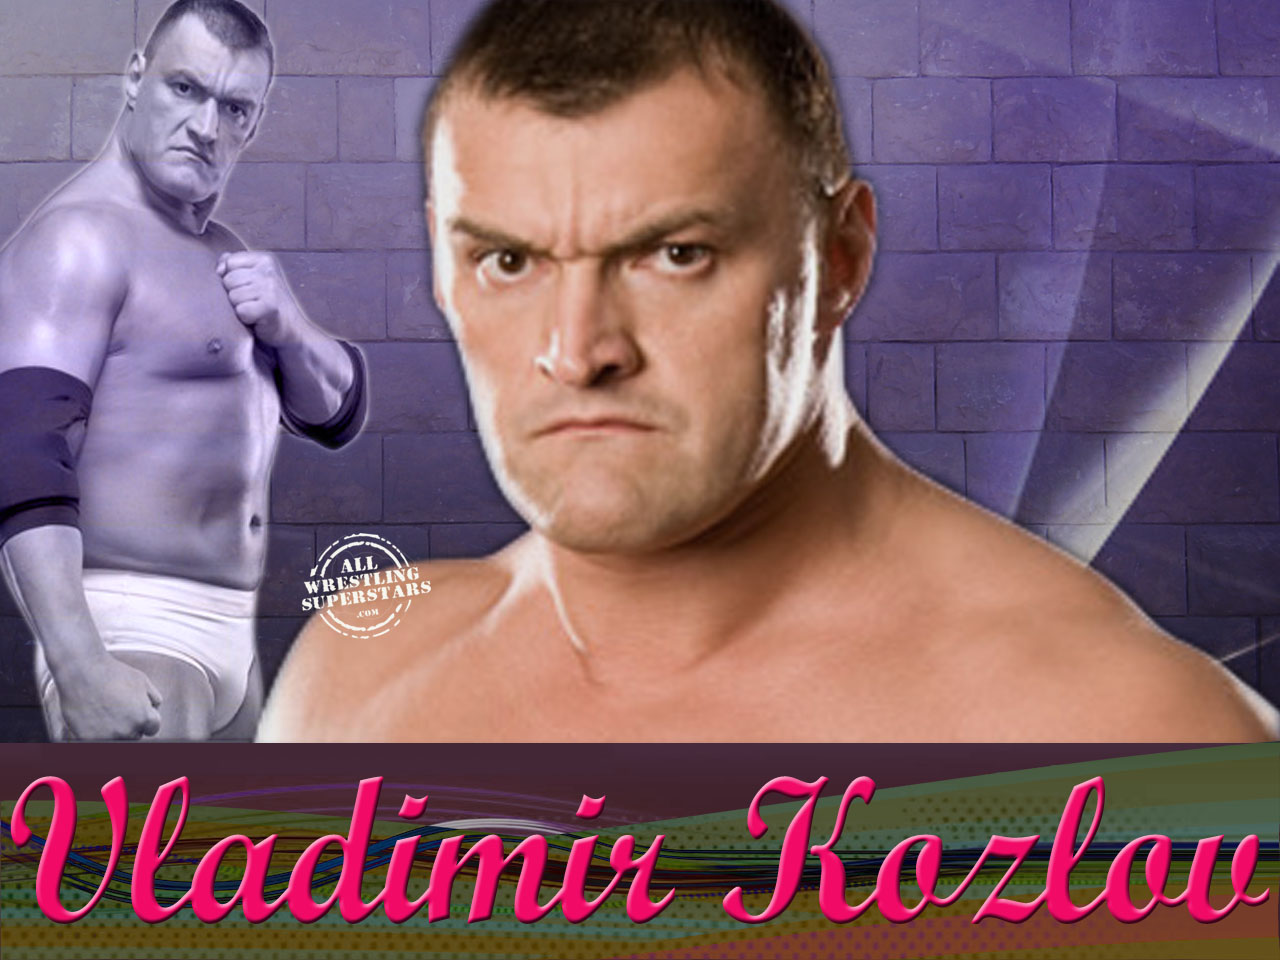 http://3.bp.blogspot.com/-uu0Frev9yOg/TjWHtjVUUJI/AAAAAAAADqQ/rtP8OLJ3zRc/s1600/vladimir-kozlov-wallpapers-.jpg